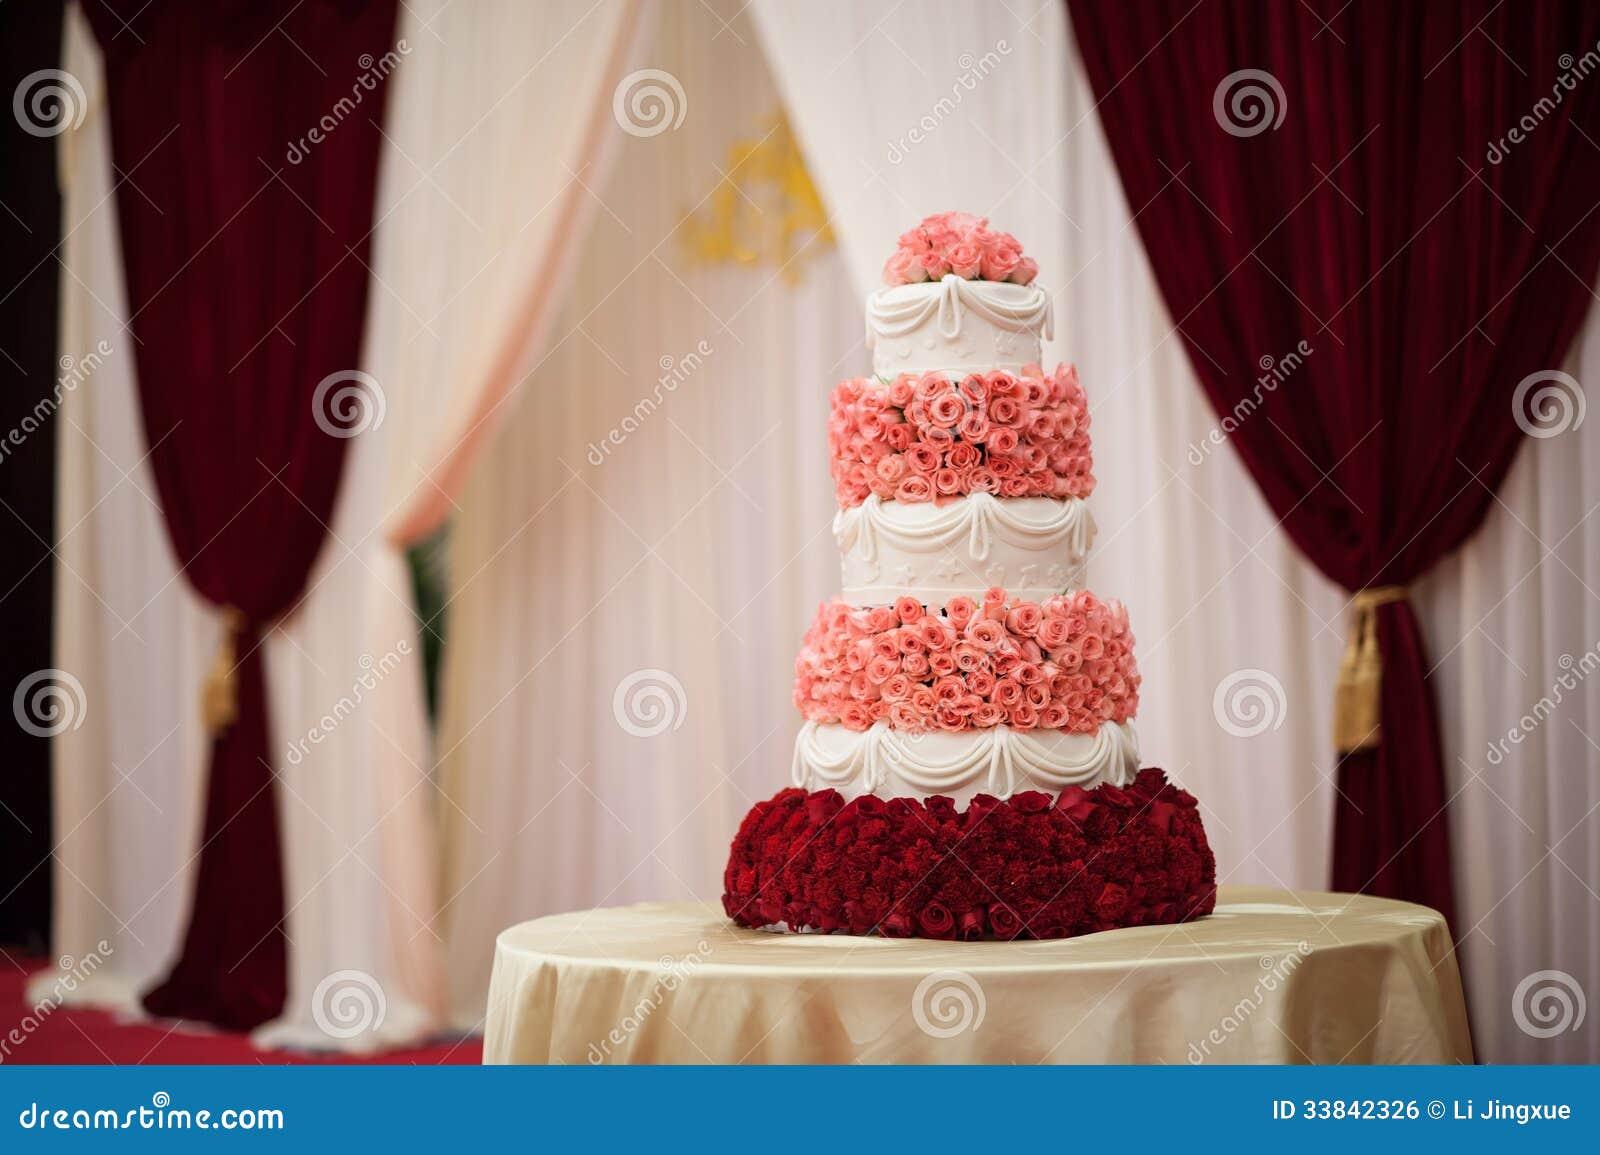 Wedding Cake Stock Photo Image Of Break Dessert Couple